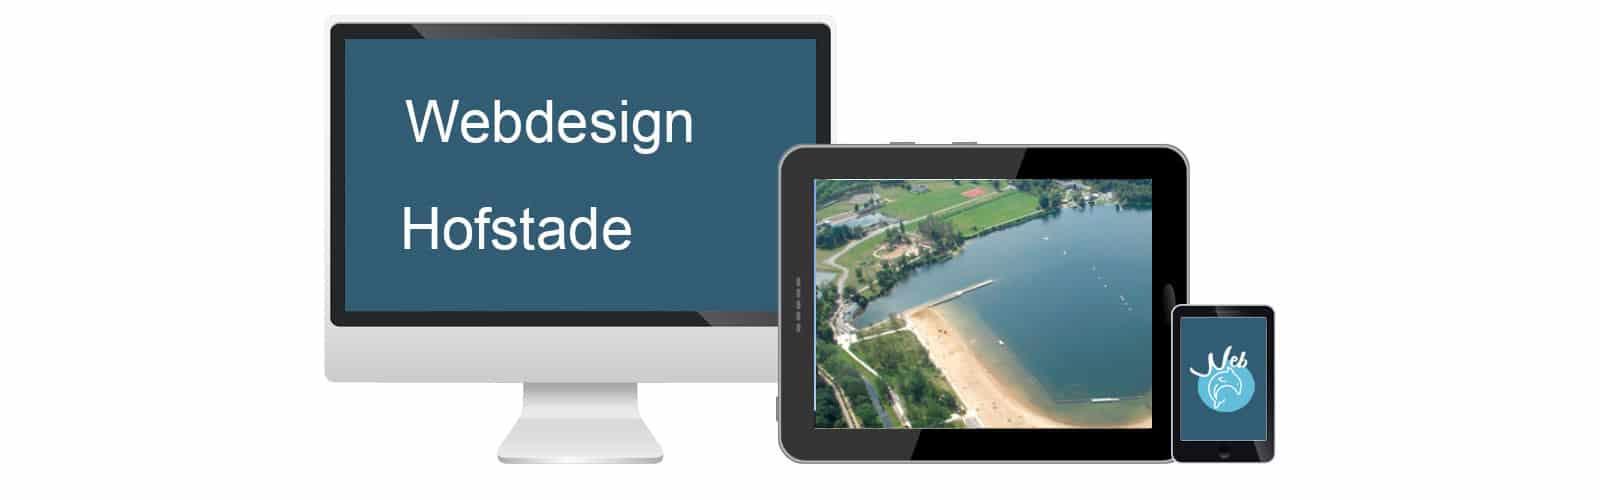 Webdesign Hofstade - webdolfijn